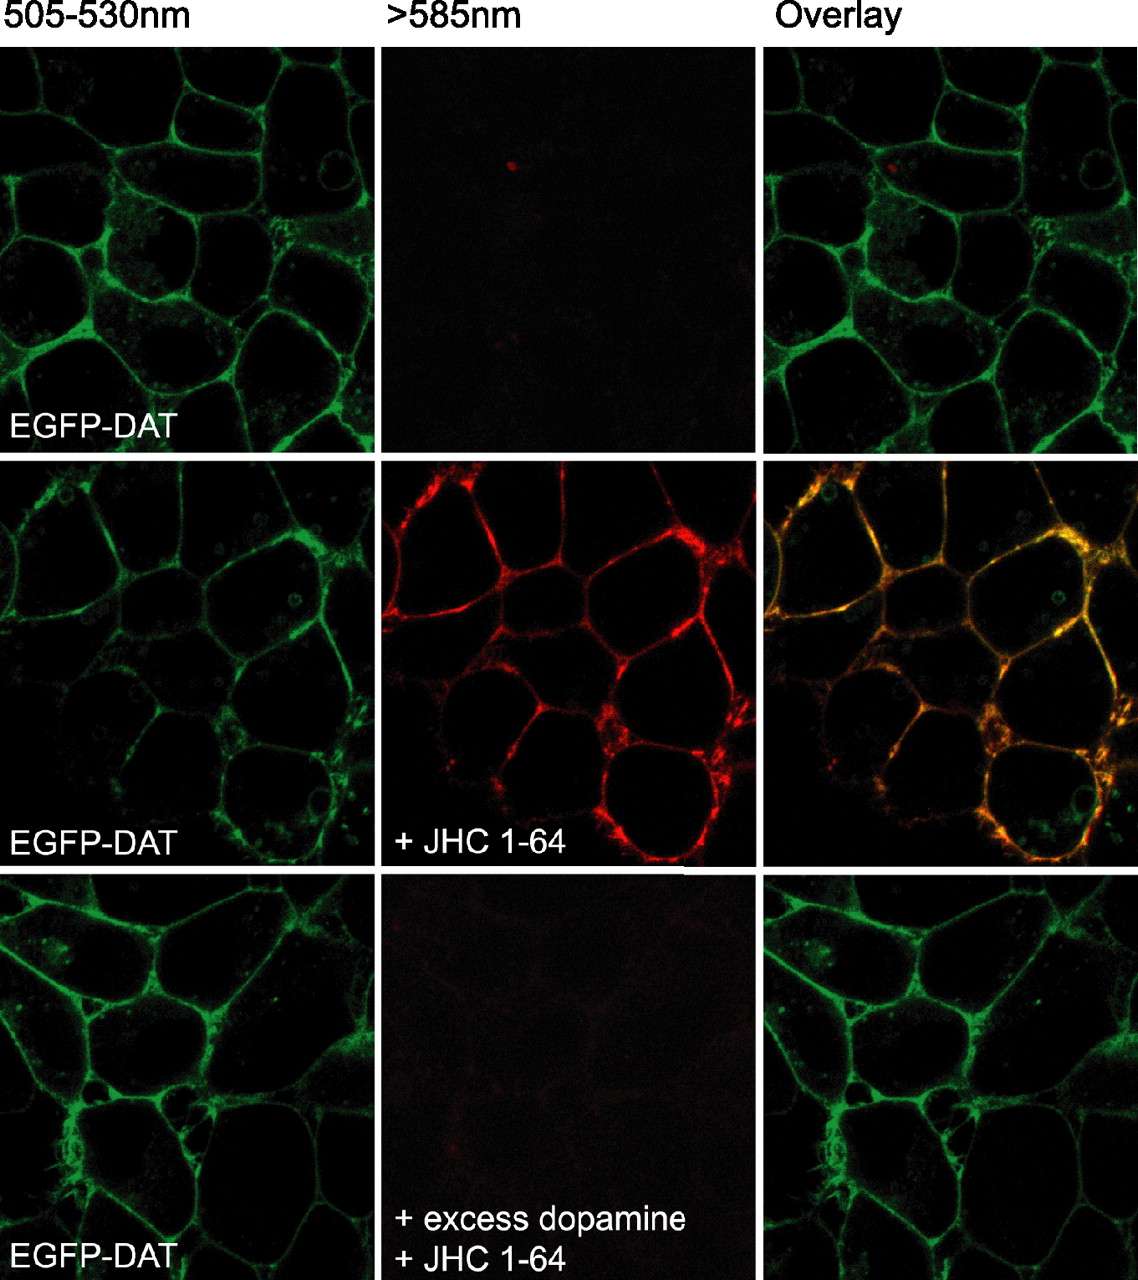 uniform excitation in epifluorescence